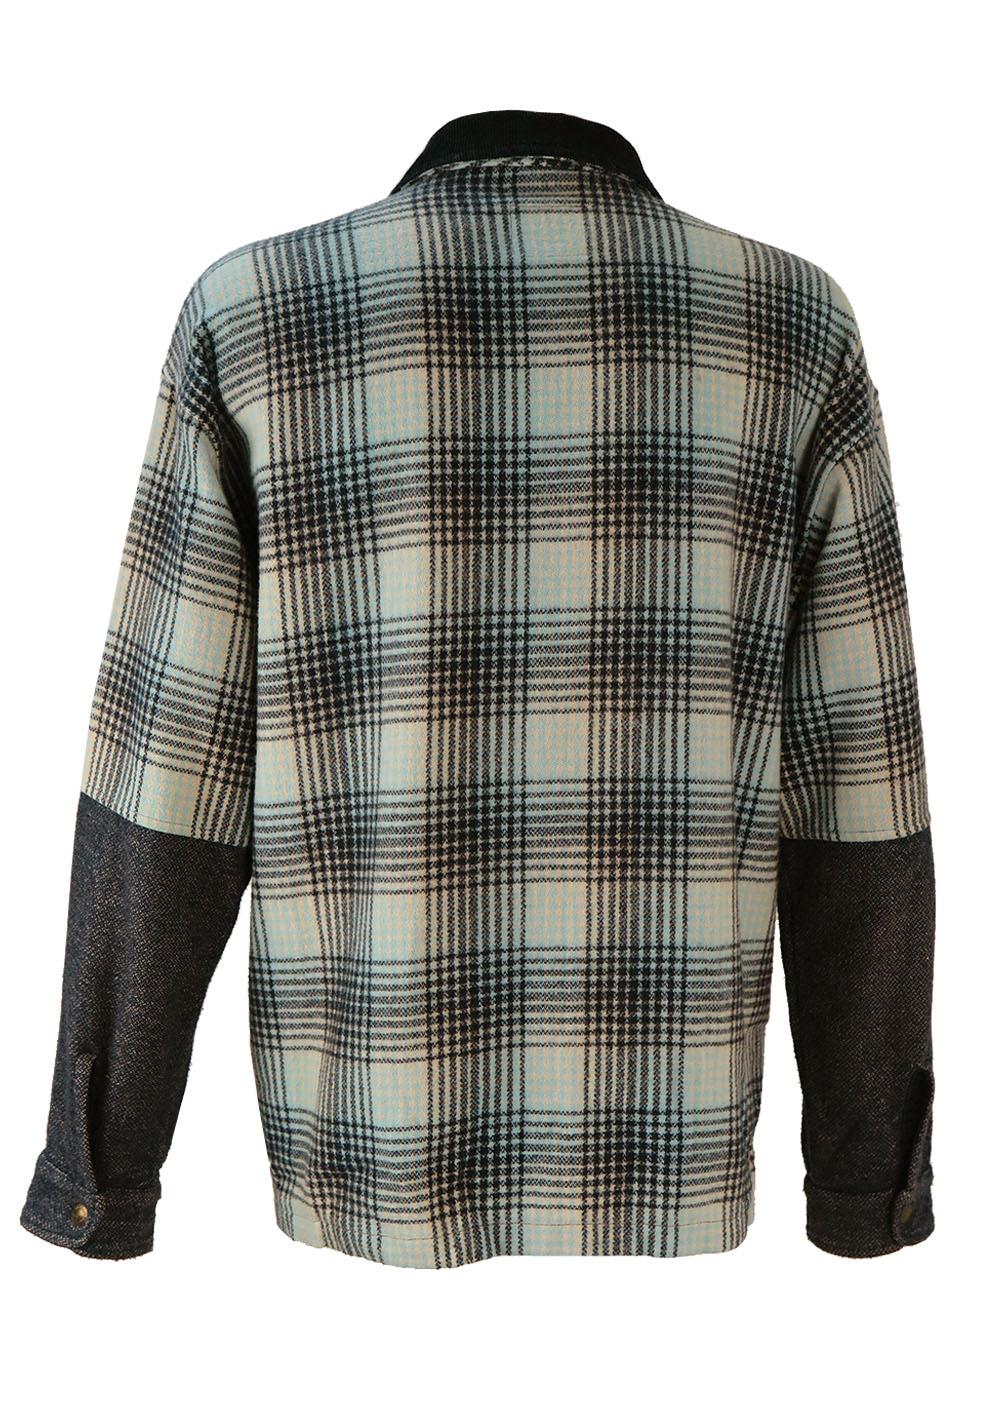 Shirt jacket design - Levis Blue Check Shirt Jacket With Corduroy Collar Xl Xxl Reign Vintage